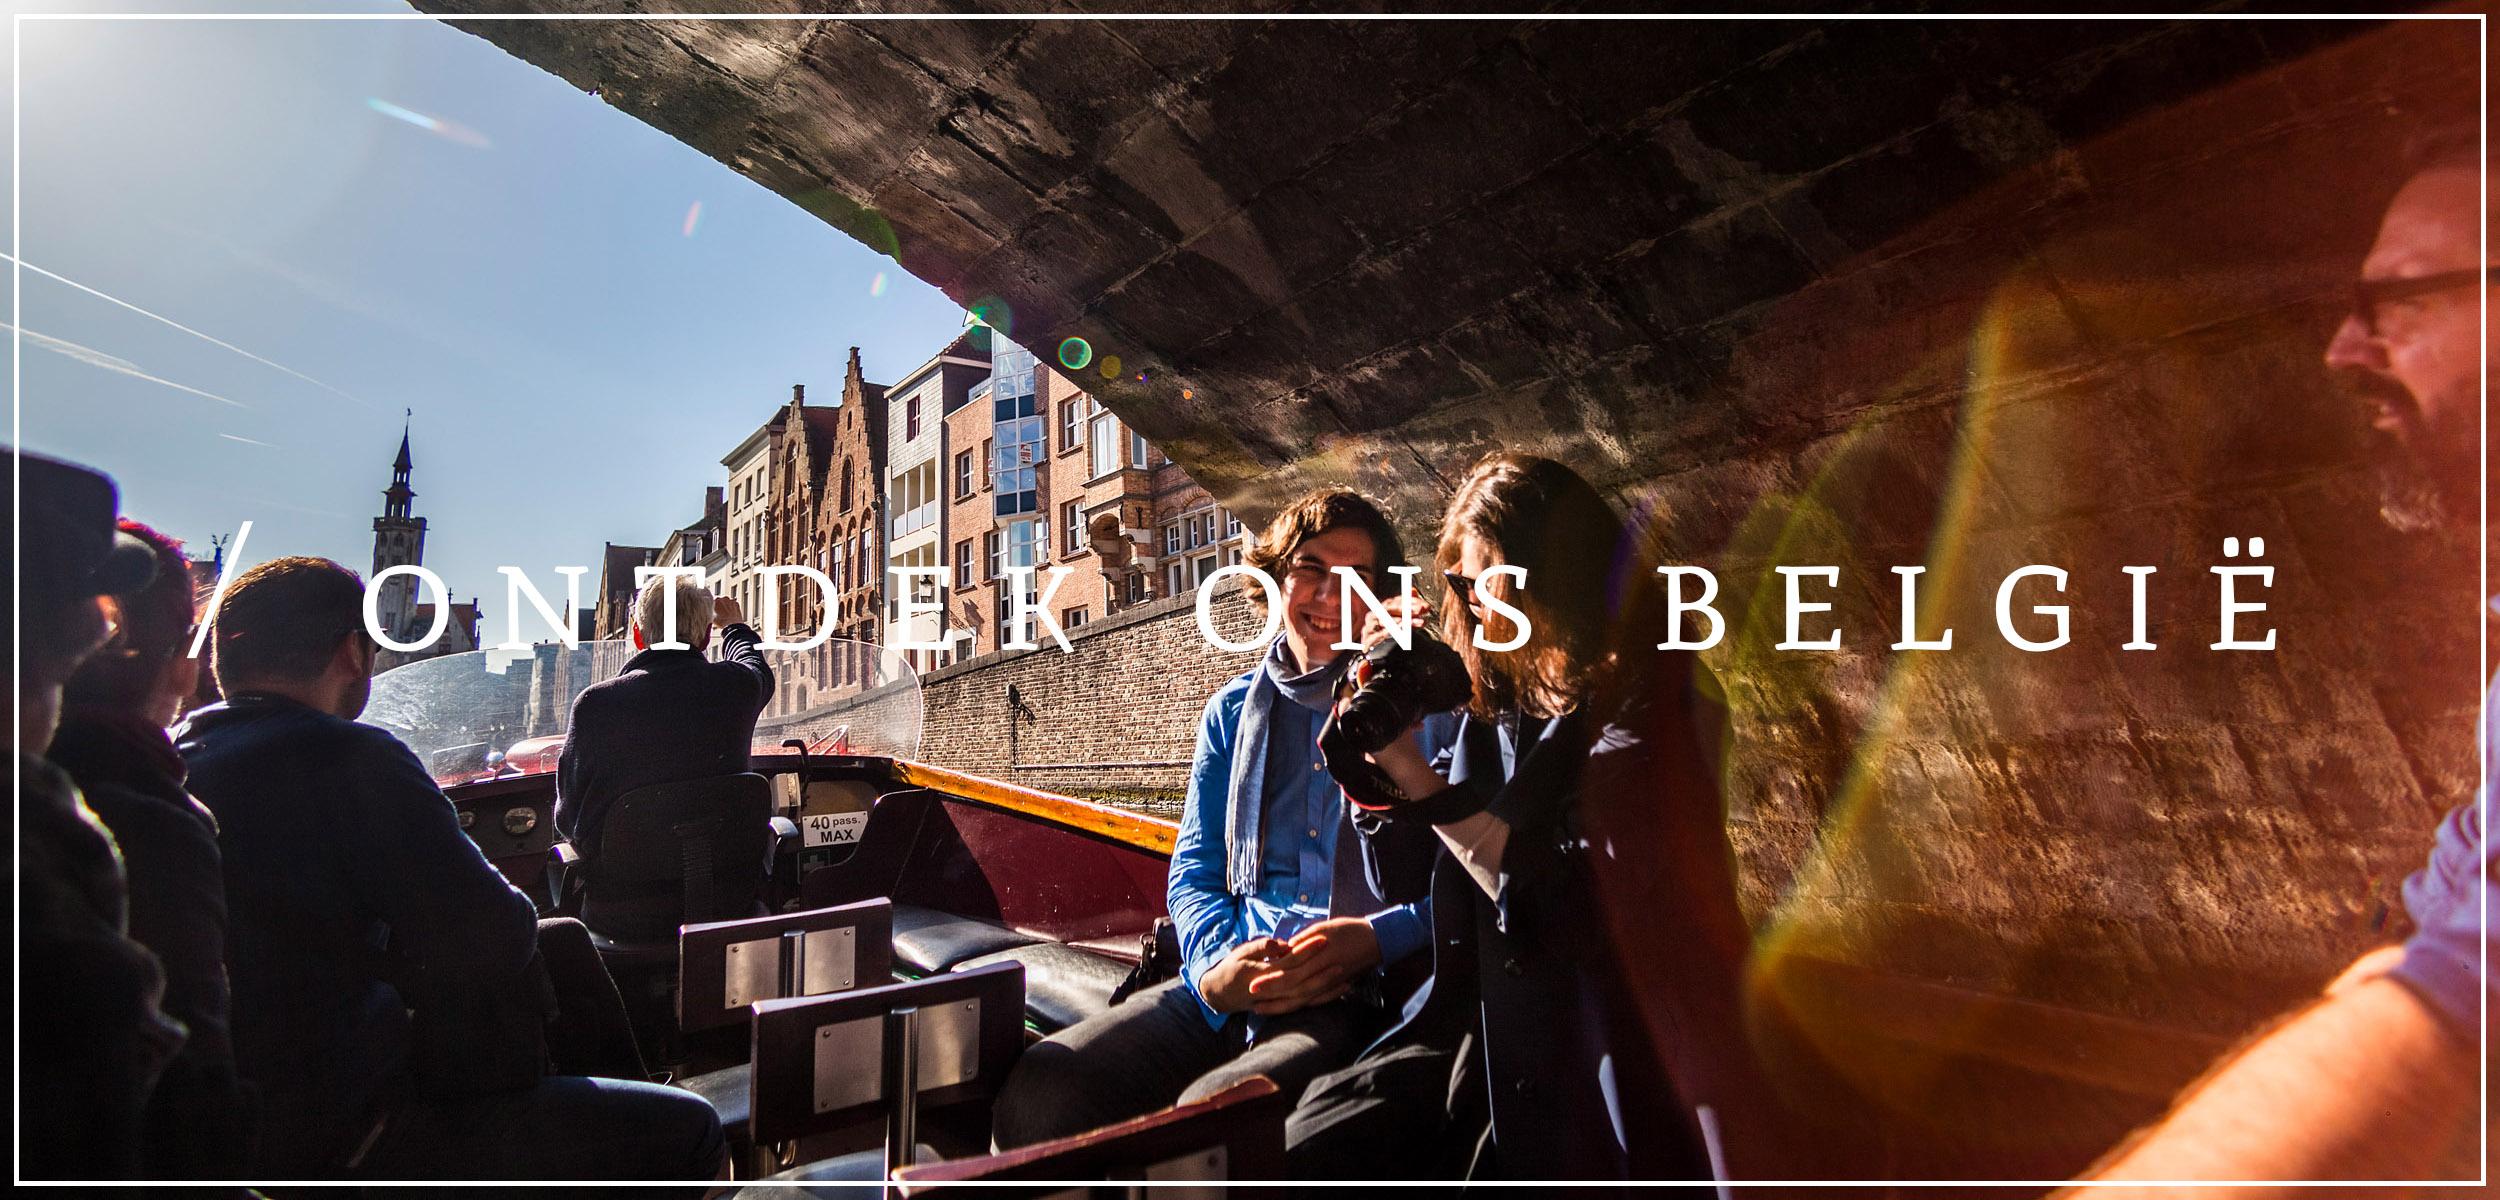 glenn vanderbeke, landschapsfotografie, landschapsfotograaf, foto uitstap, foto dagtrip, fotografische dagtrip, west-vlaamse fotografen, west-vlaamse fotograaf, Foto uitstap, Vlaanderen, West-Vlaanderen, Boats of Bruges